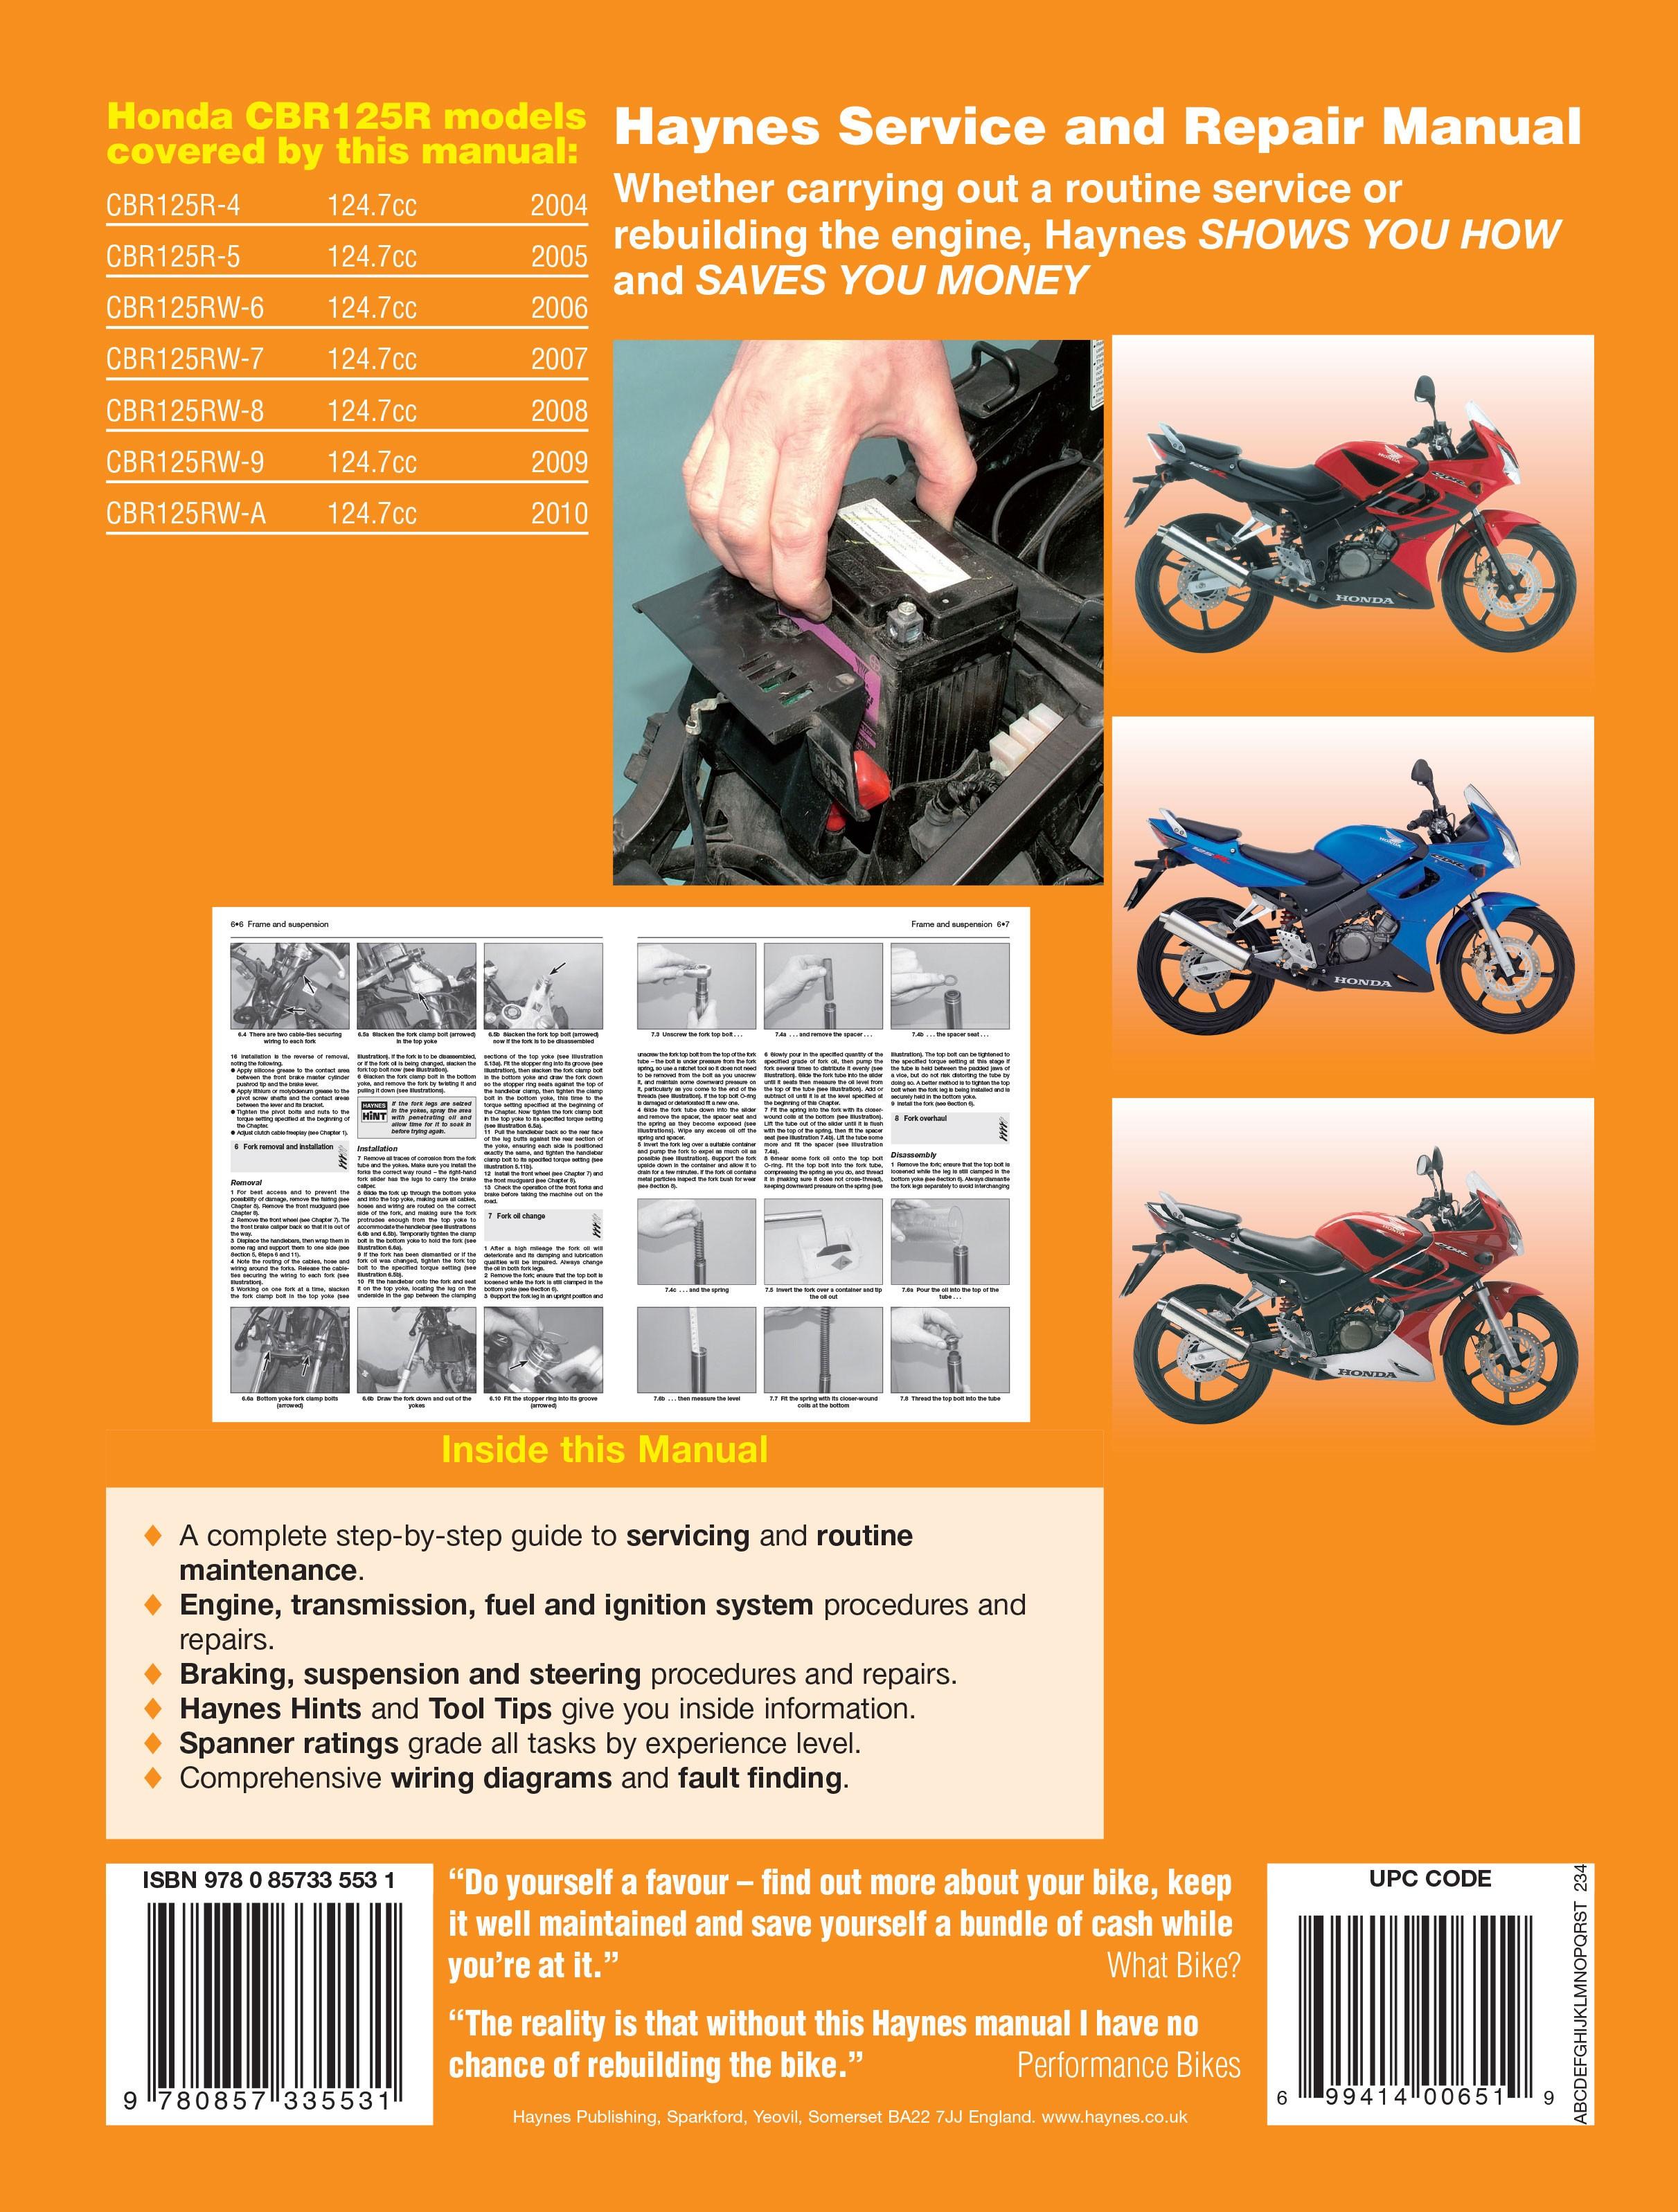 Haynes repair manual honda cbr125r 2004 2010 solutioingenieria Images